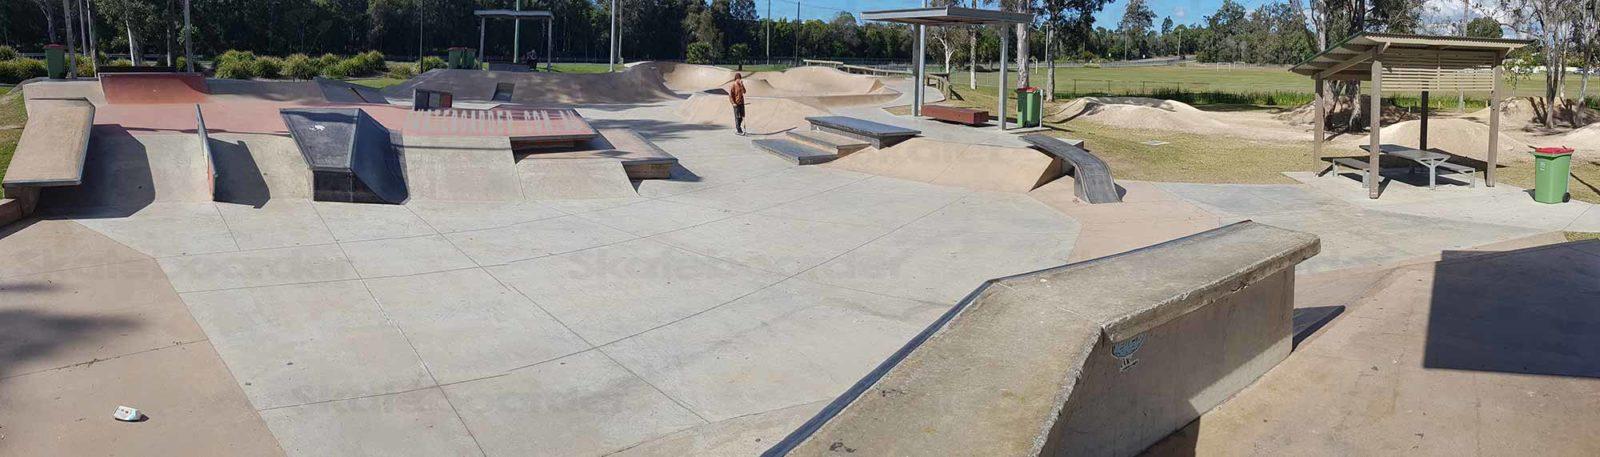 Looking over Ormeau Skatepark